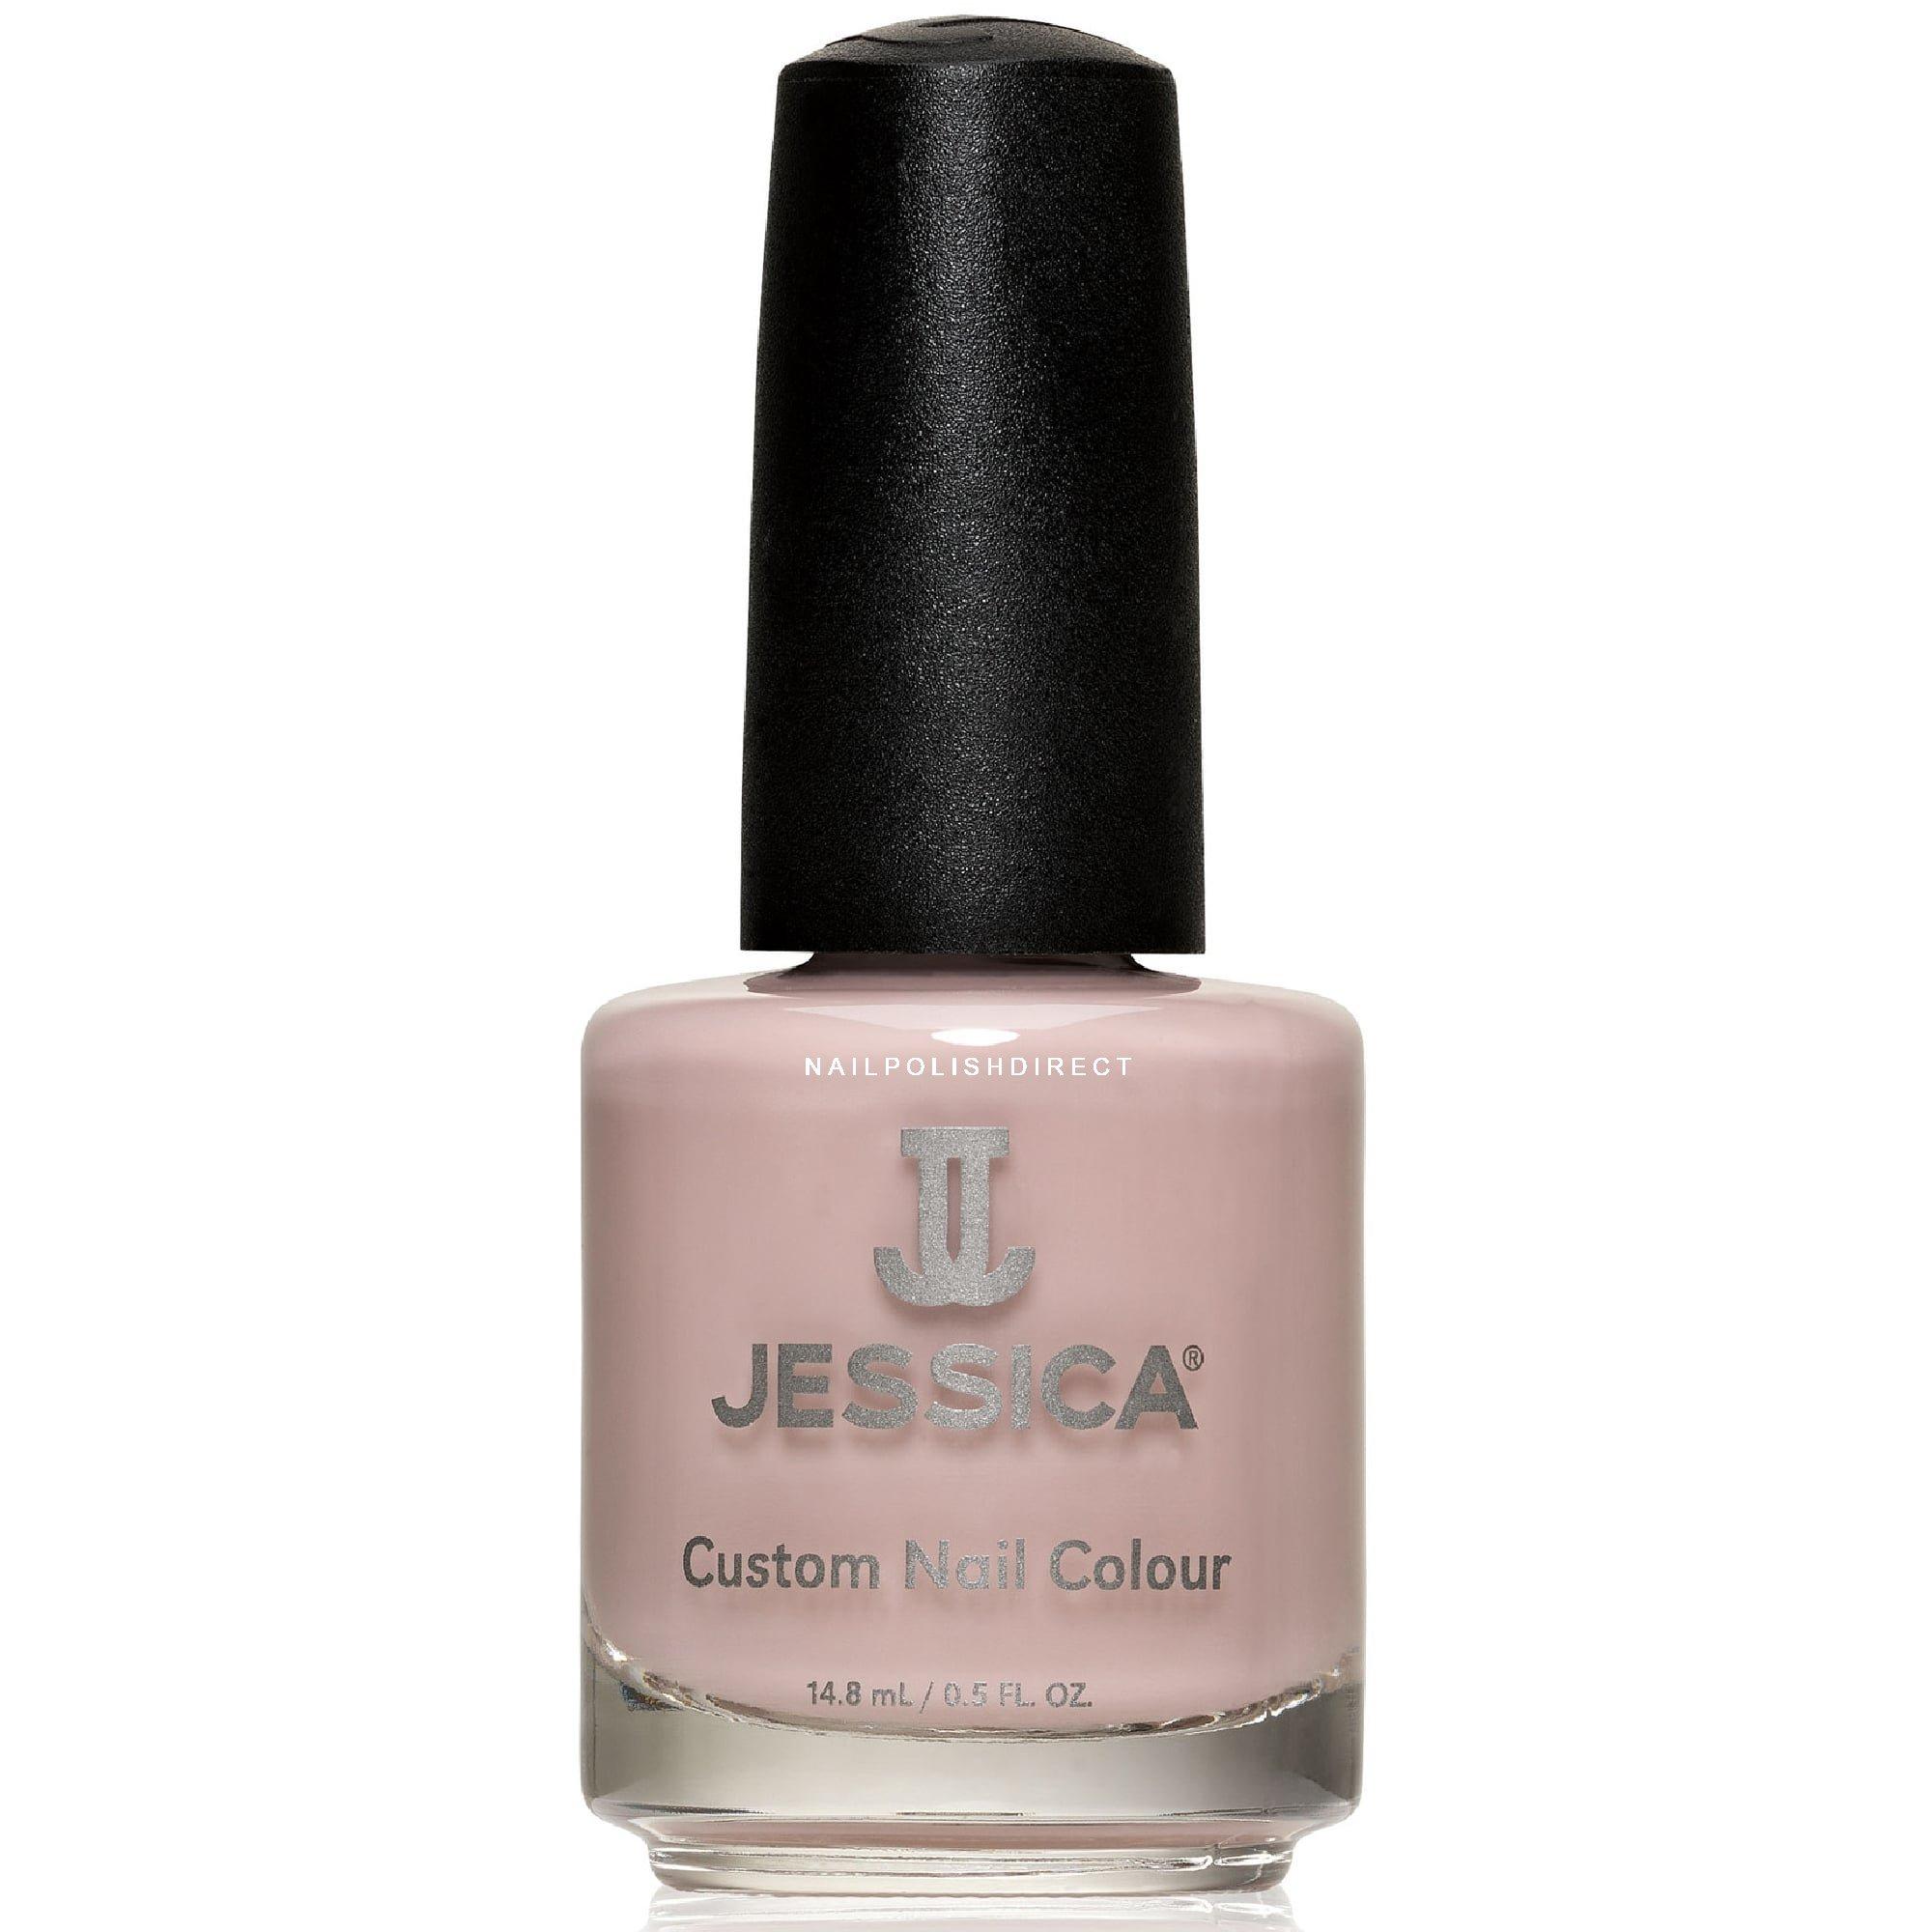 Jessica Silhouette 2017 Nail Polish Collection - Tease (1129) 14.8ml